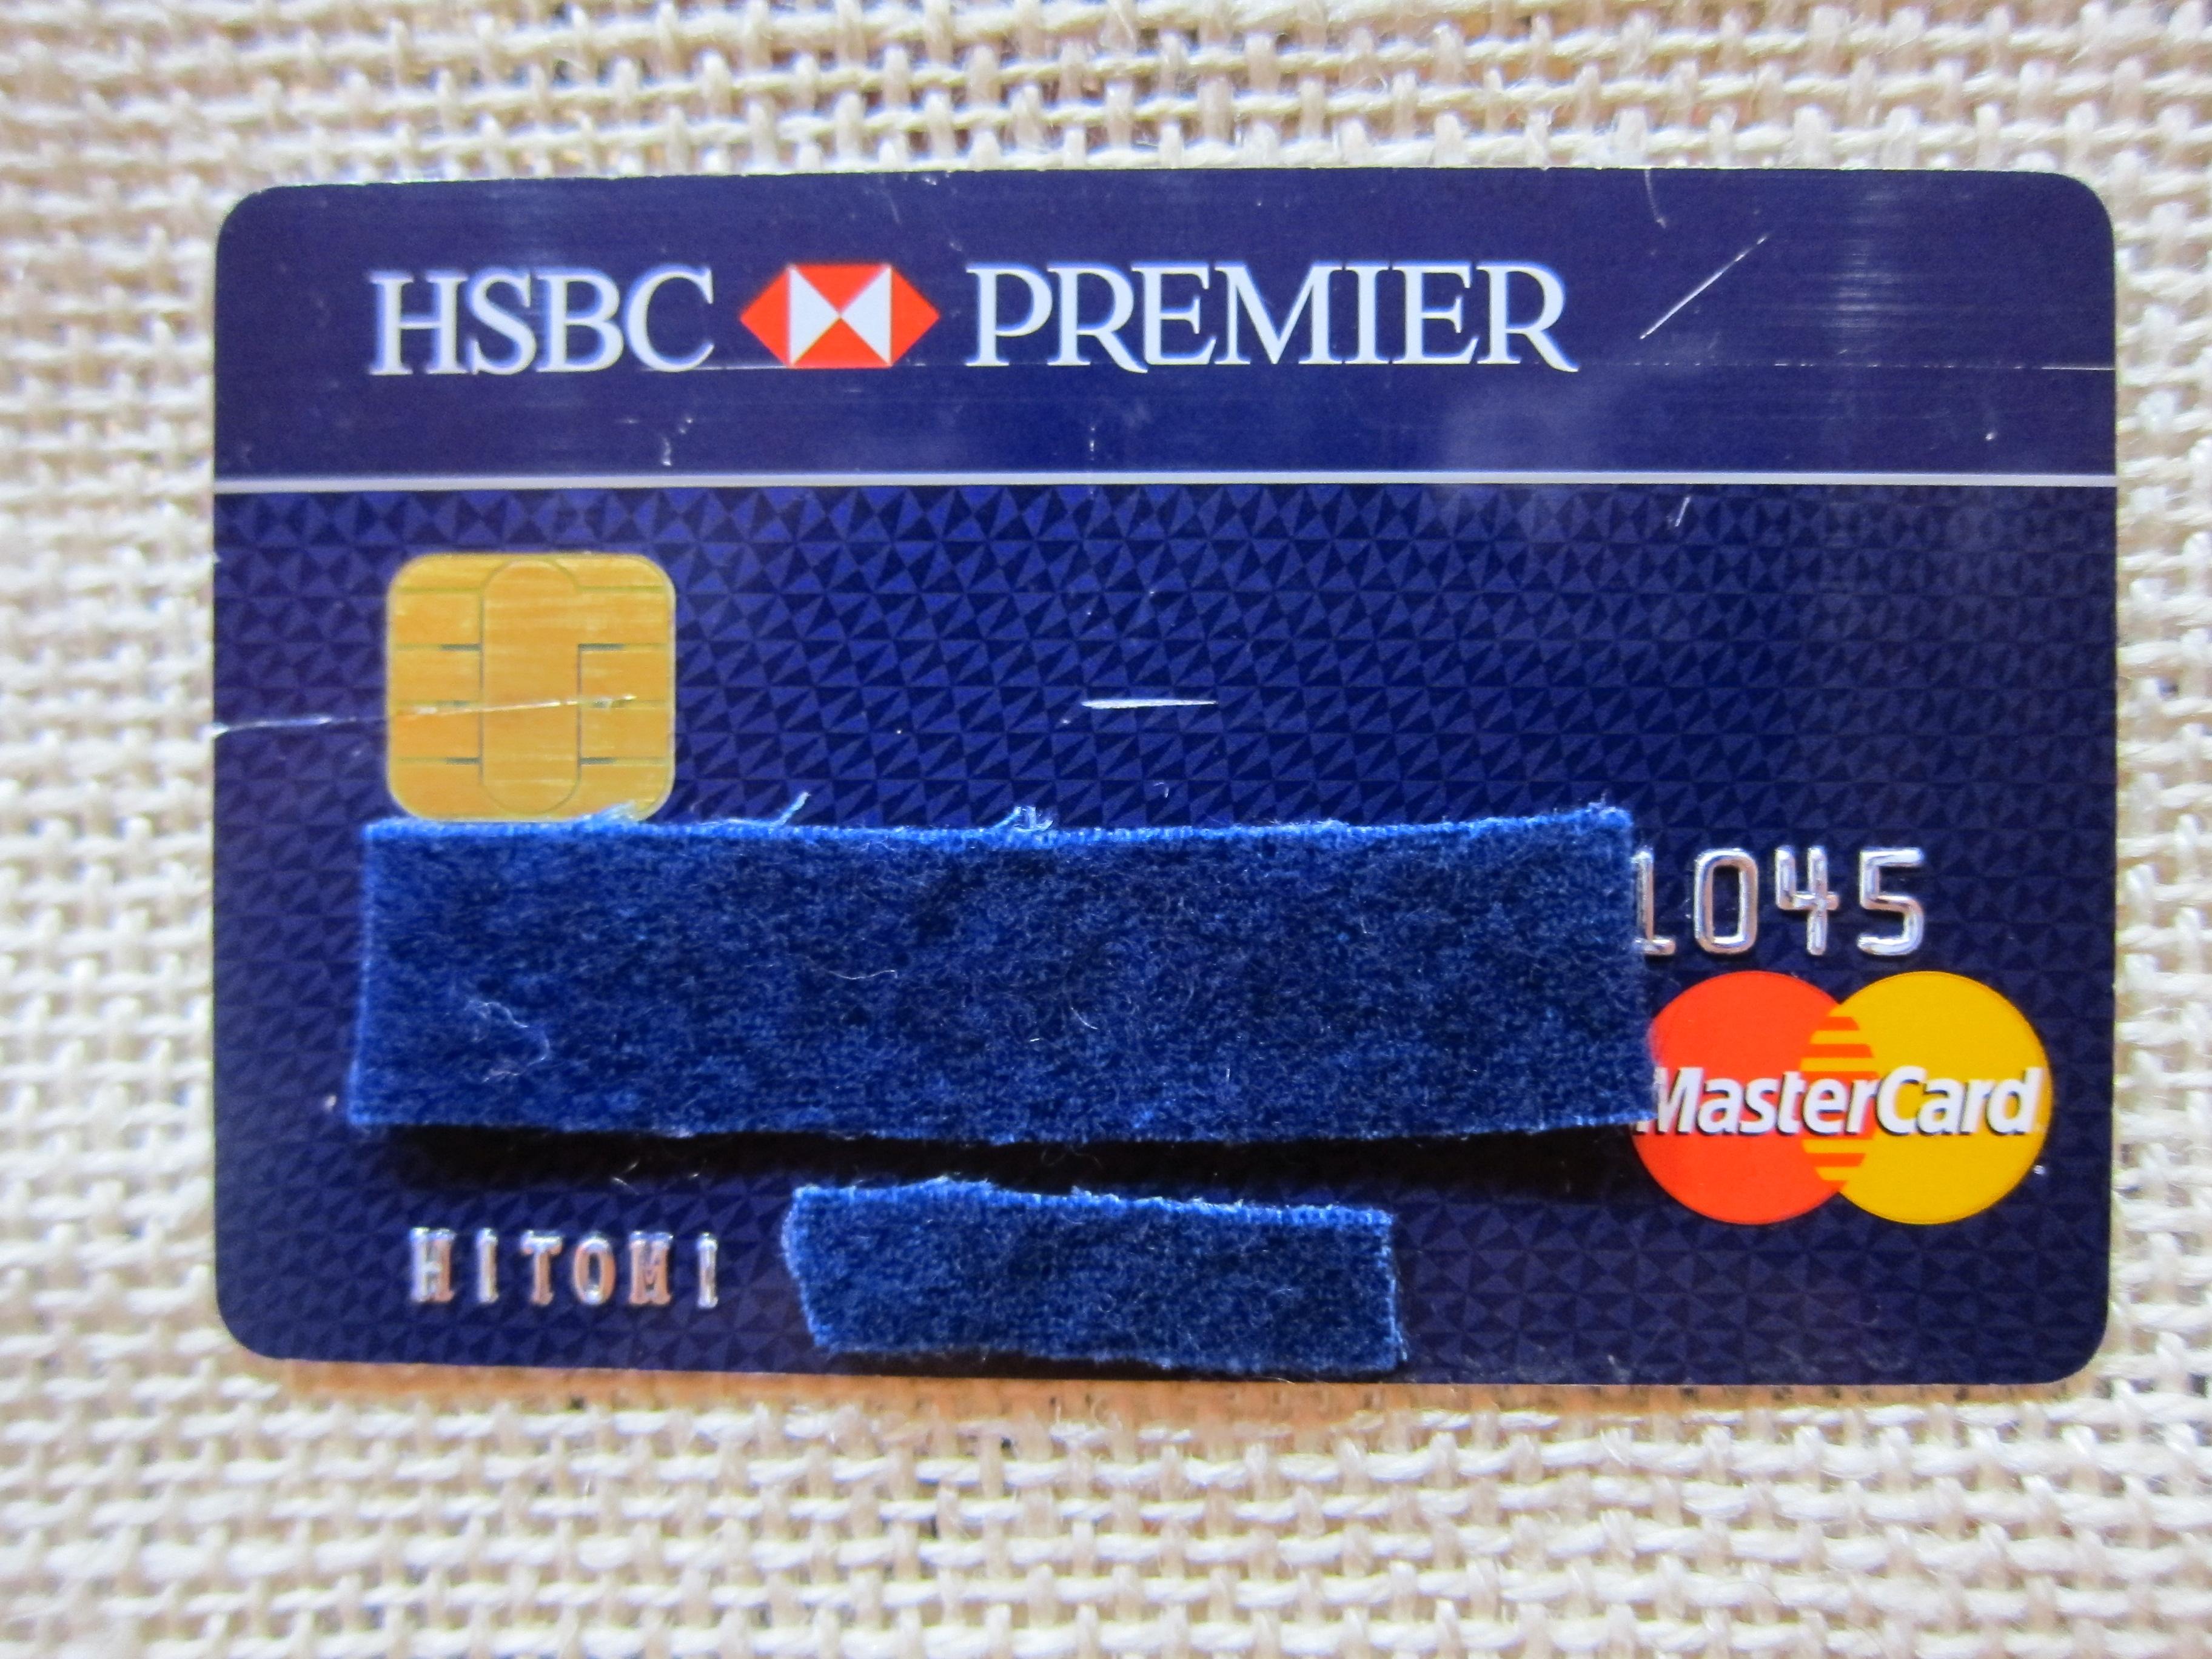 .visa credit card numbers and security codes